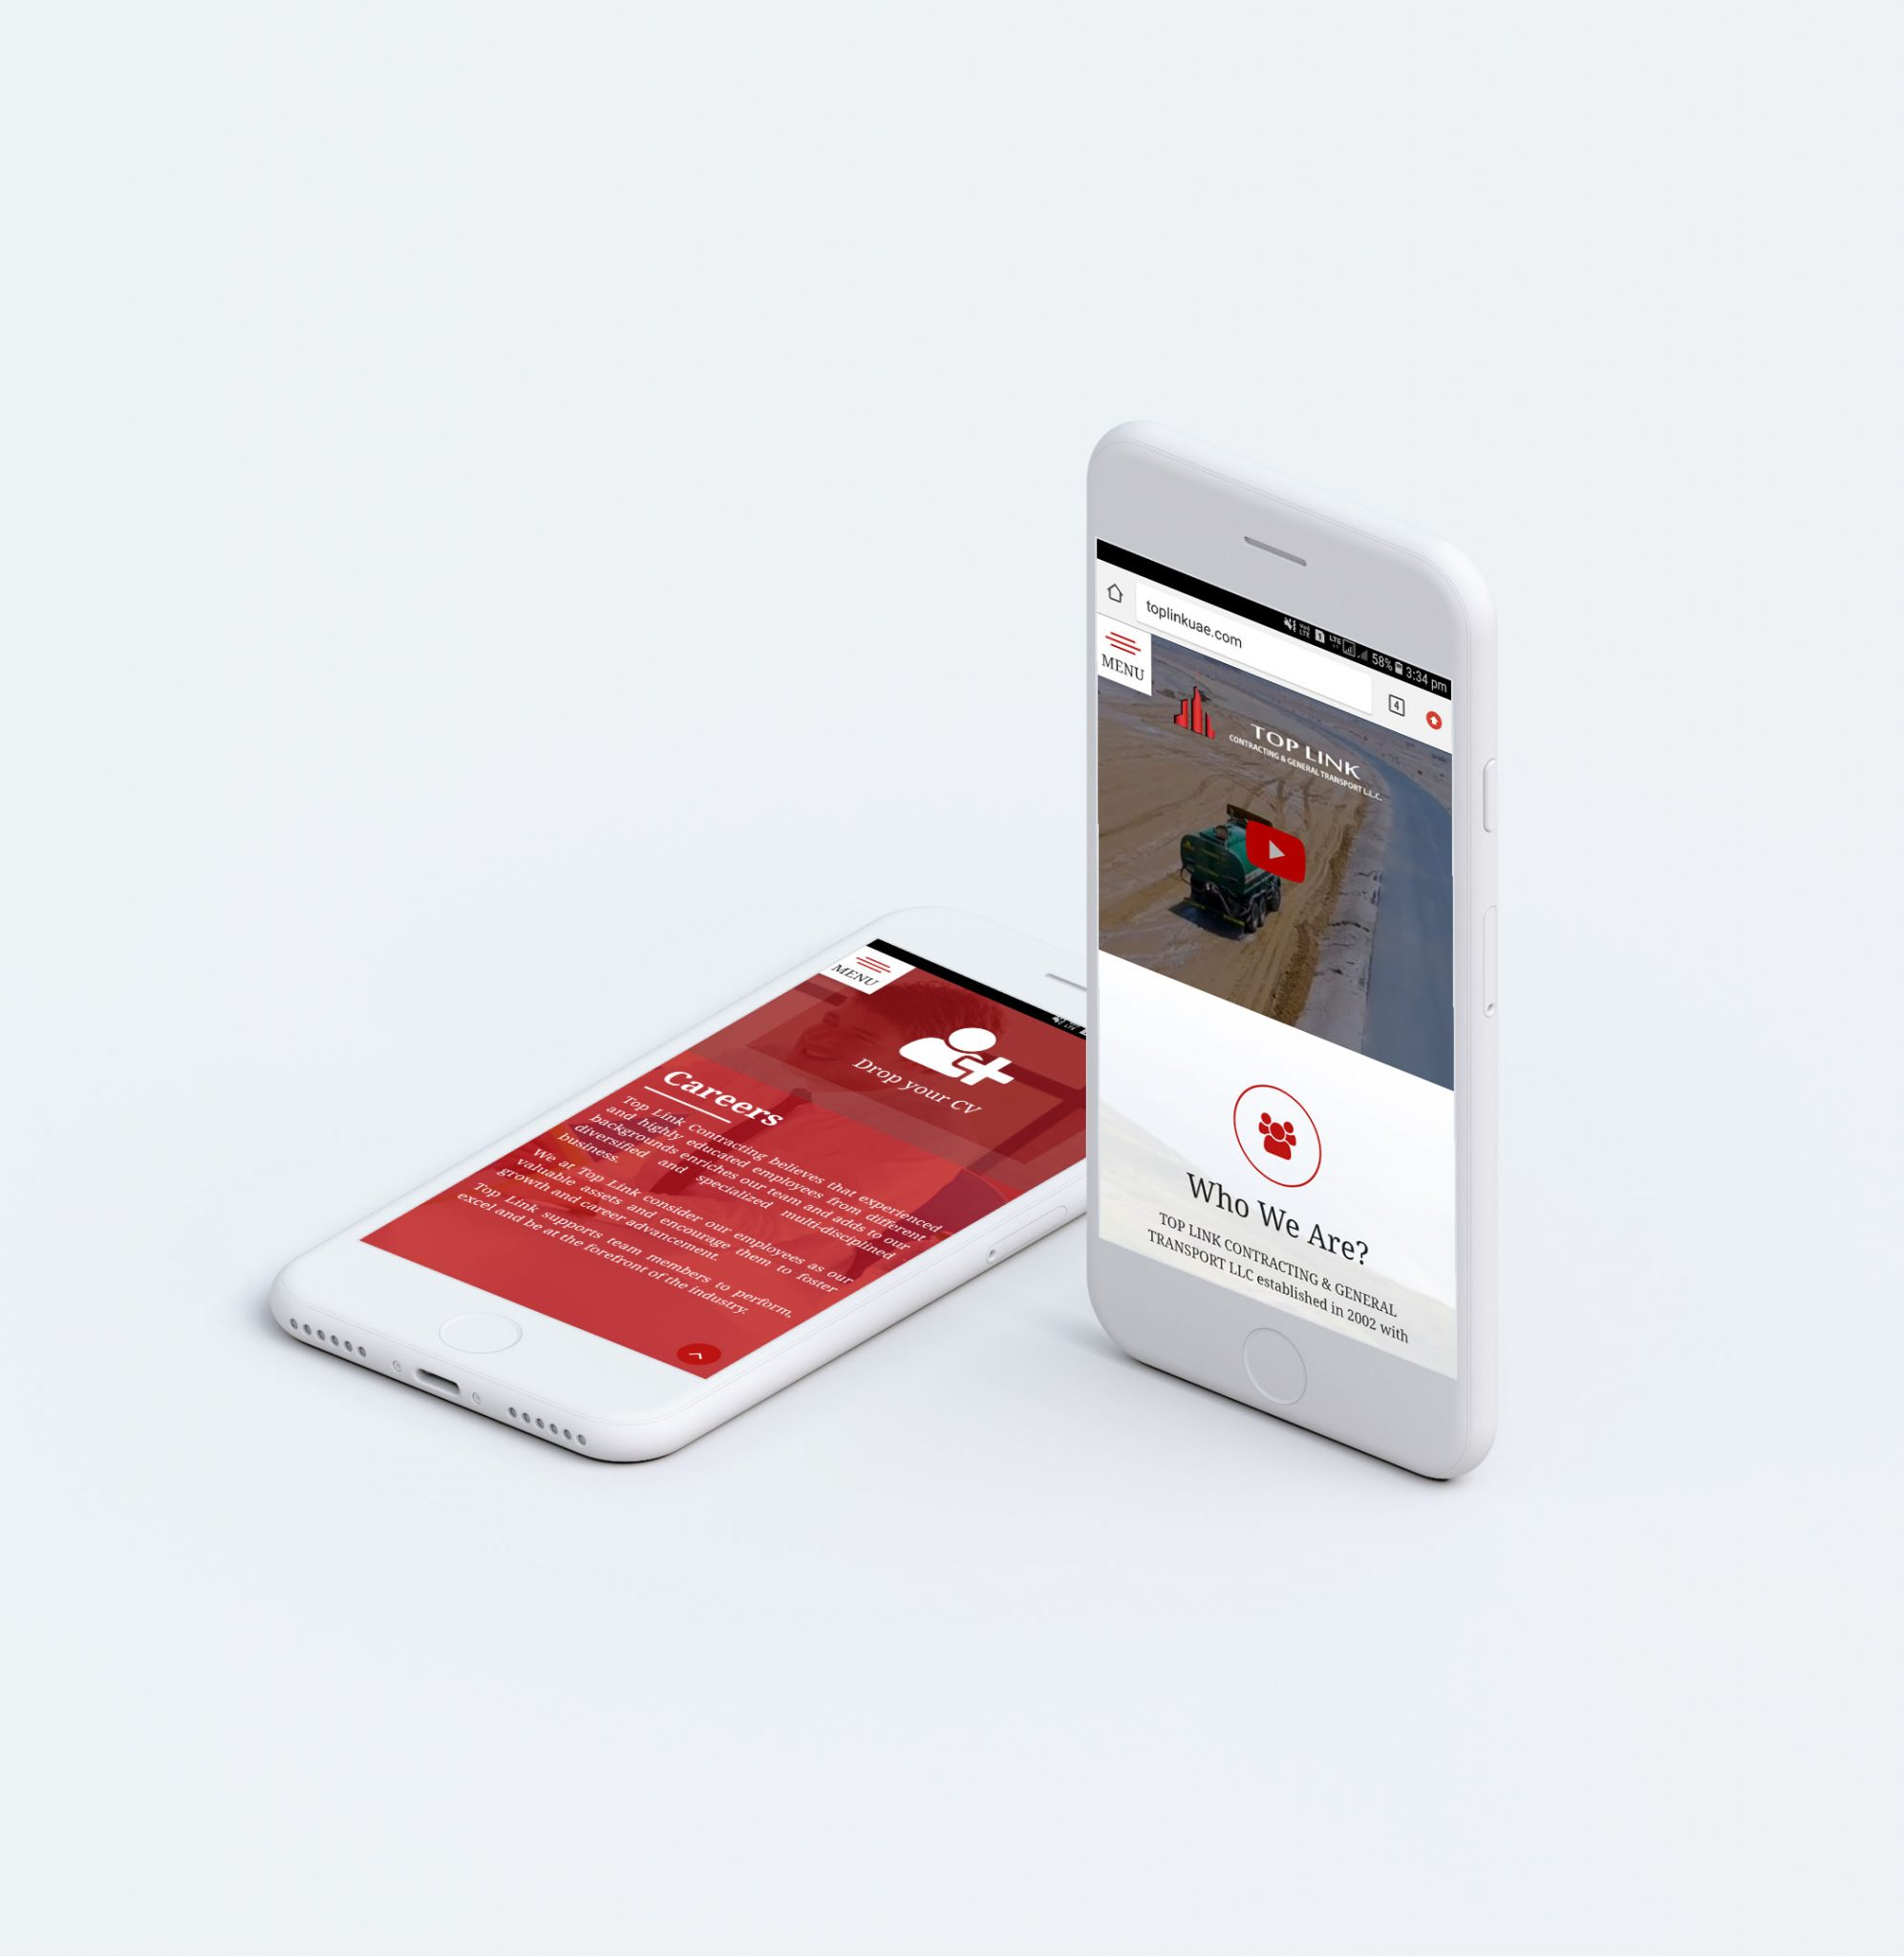 toplink-mobile-mockup